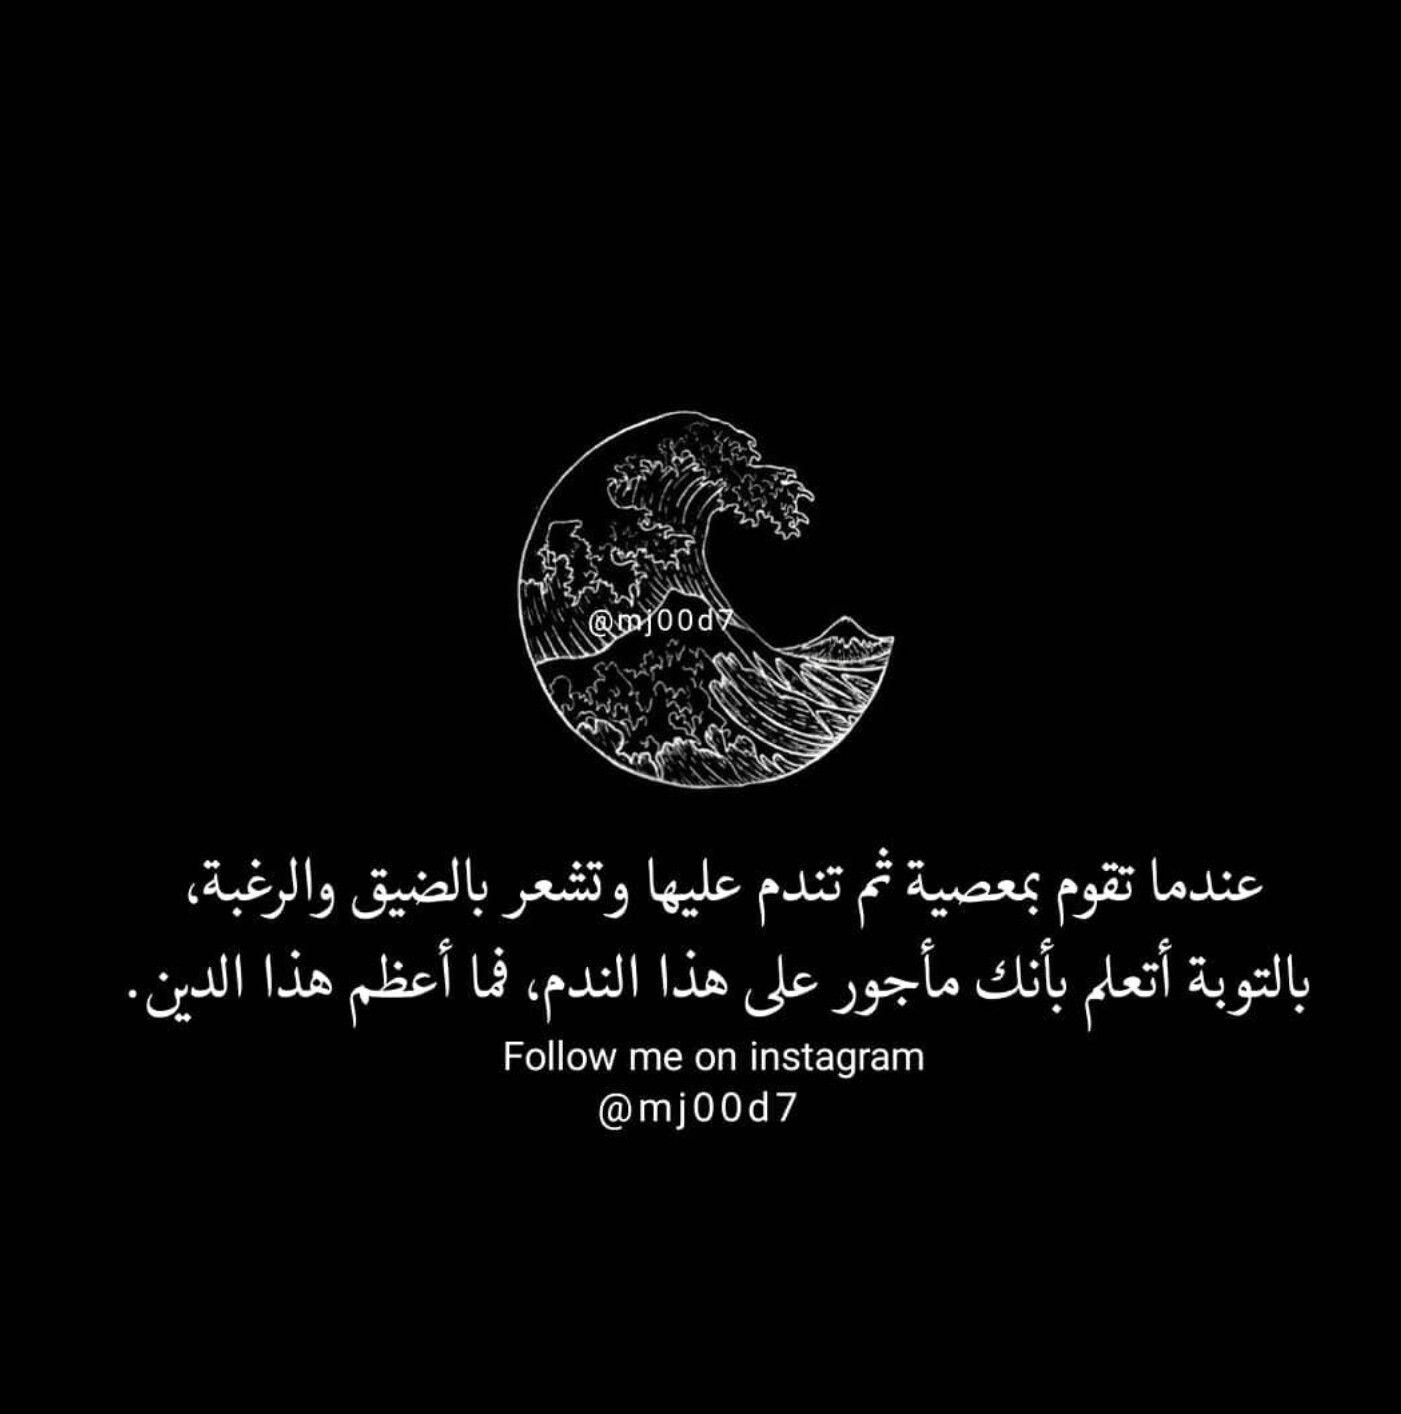 وفي الندم علي الذنب توبة Muslimah Words Quotes Islamic Quotes Brave Quotes